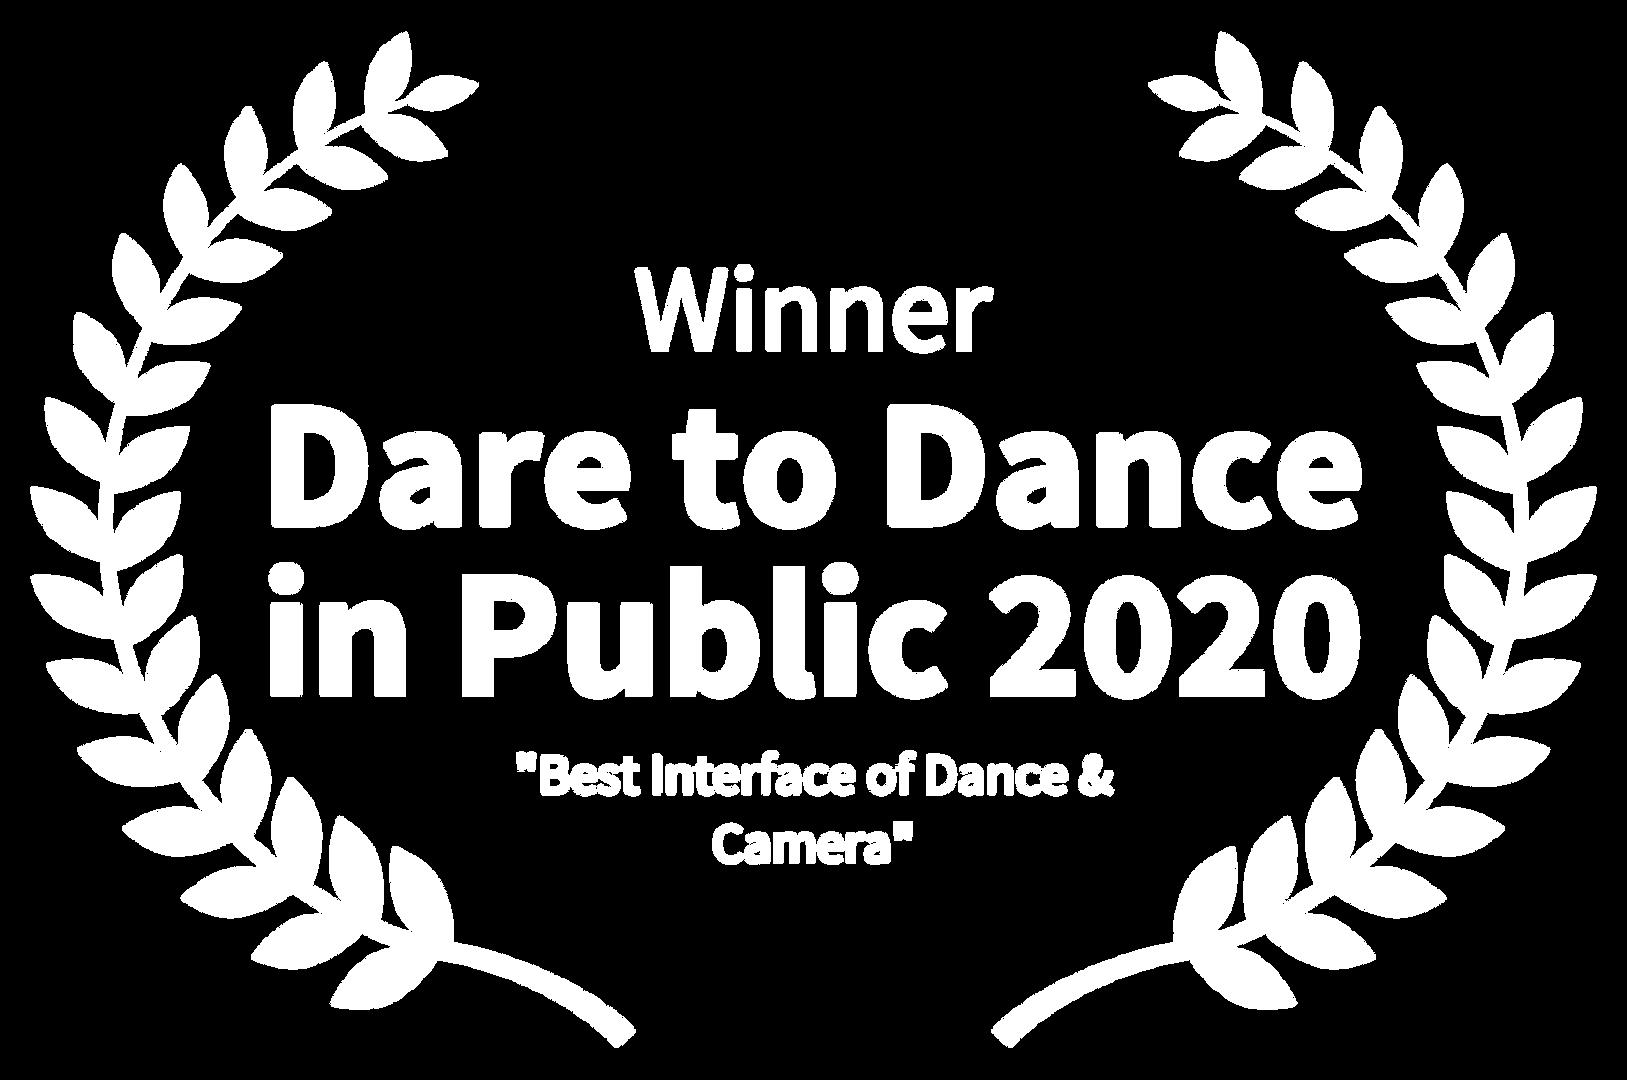 Winner - Dare to Dance in Public 2020 -